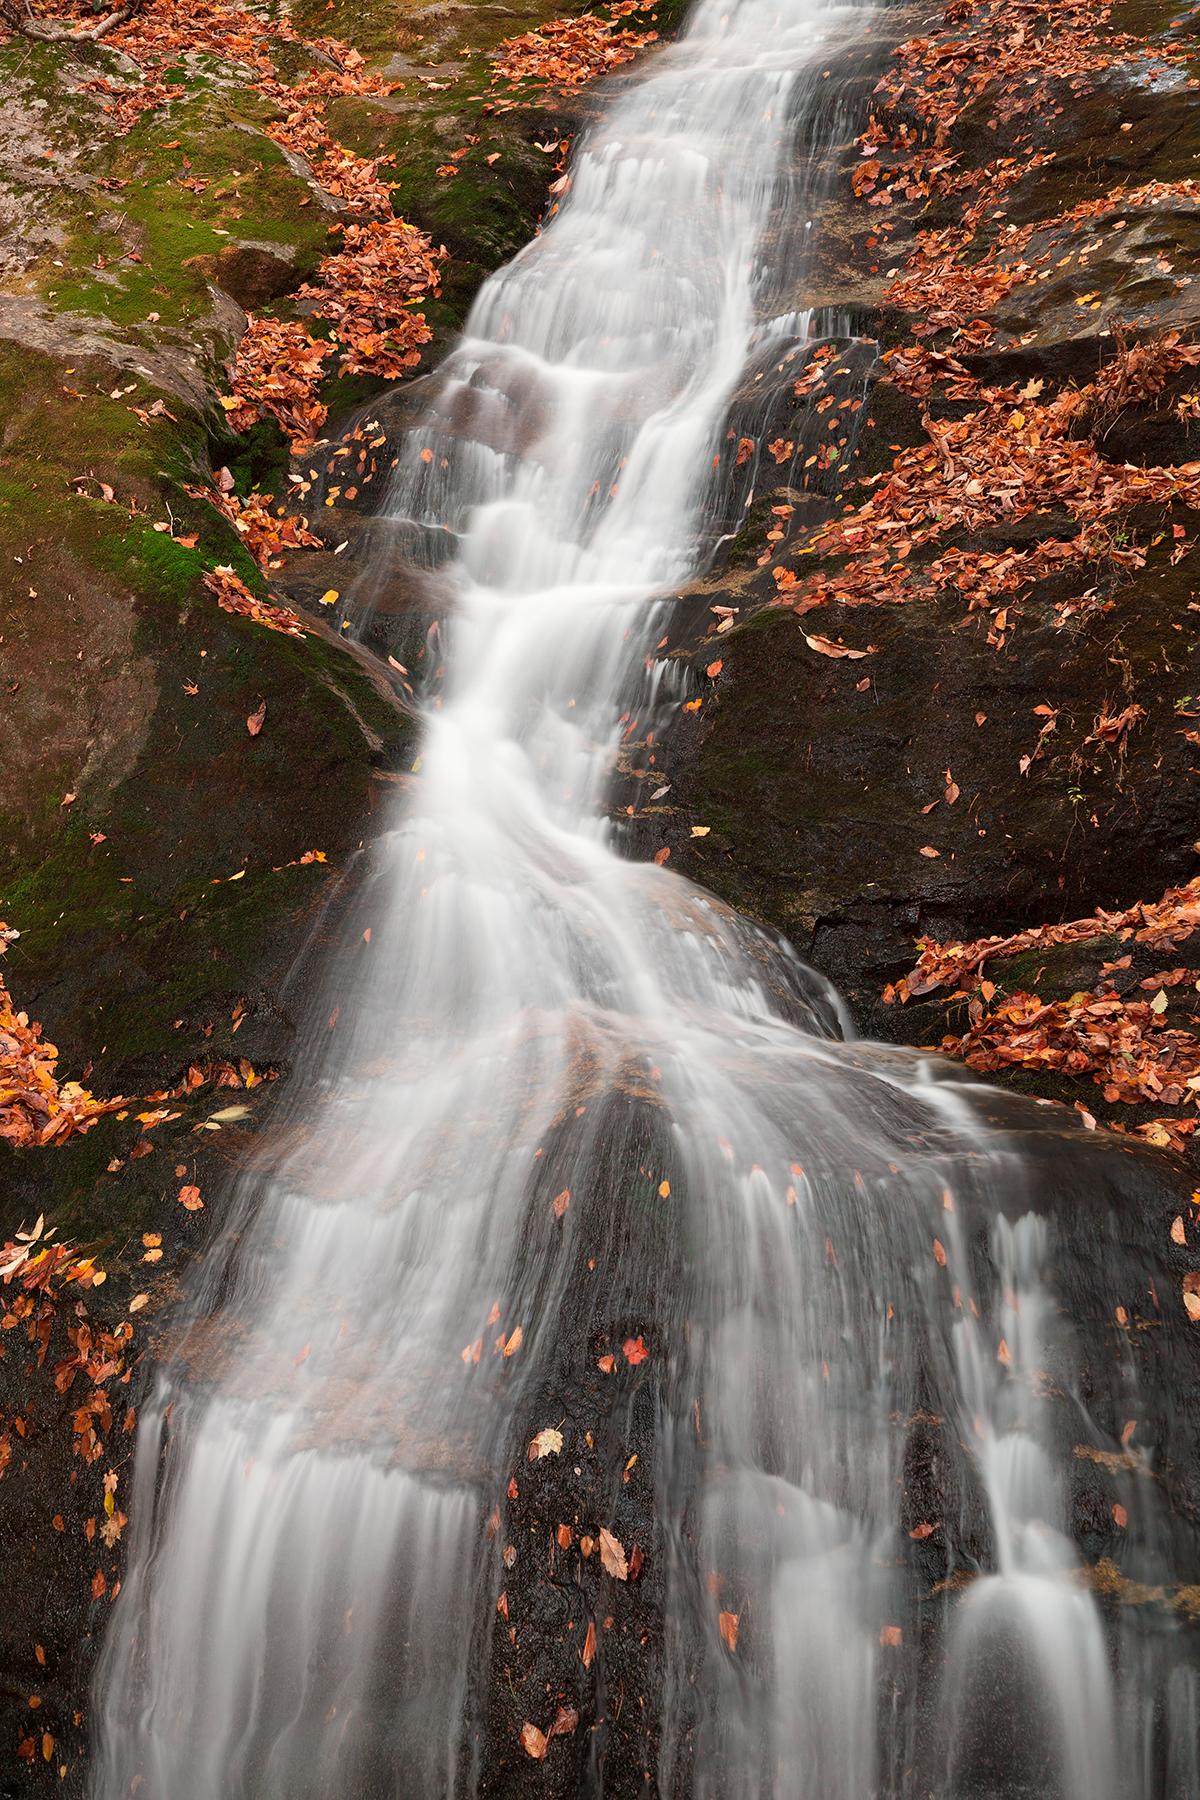 Autumn Crabtree Falls, America, Pristine, Shade, Serenity, HQ Photo